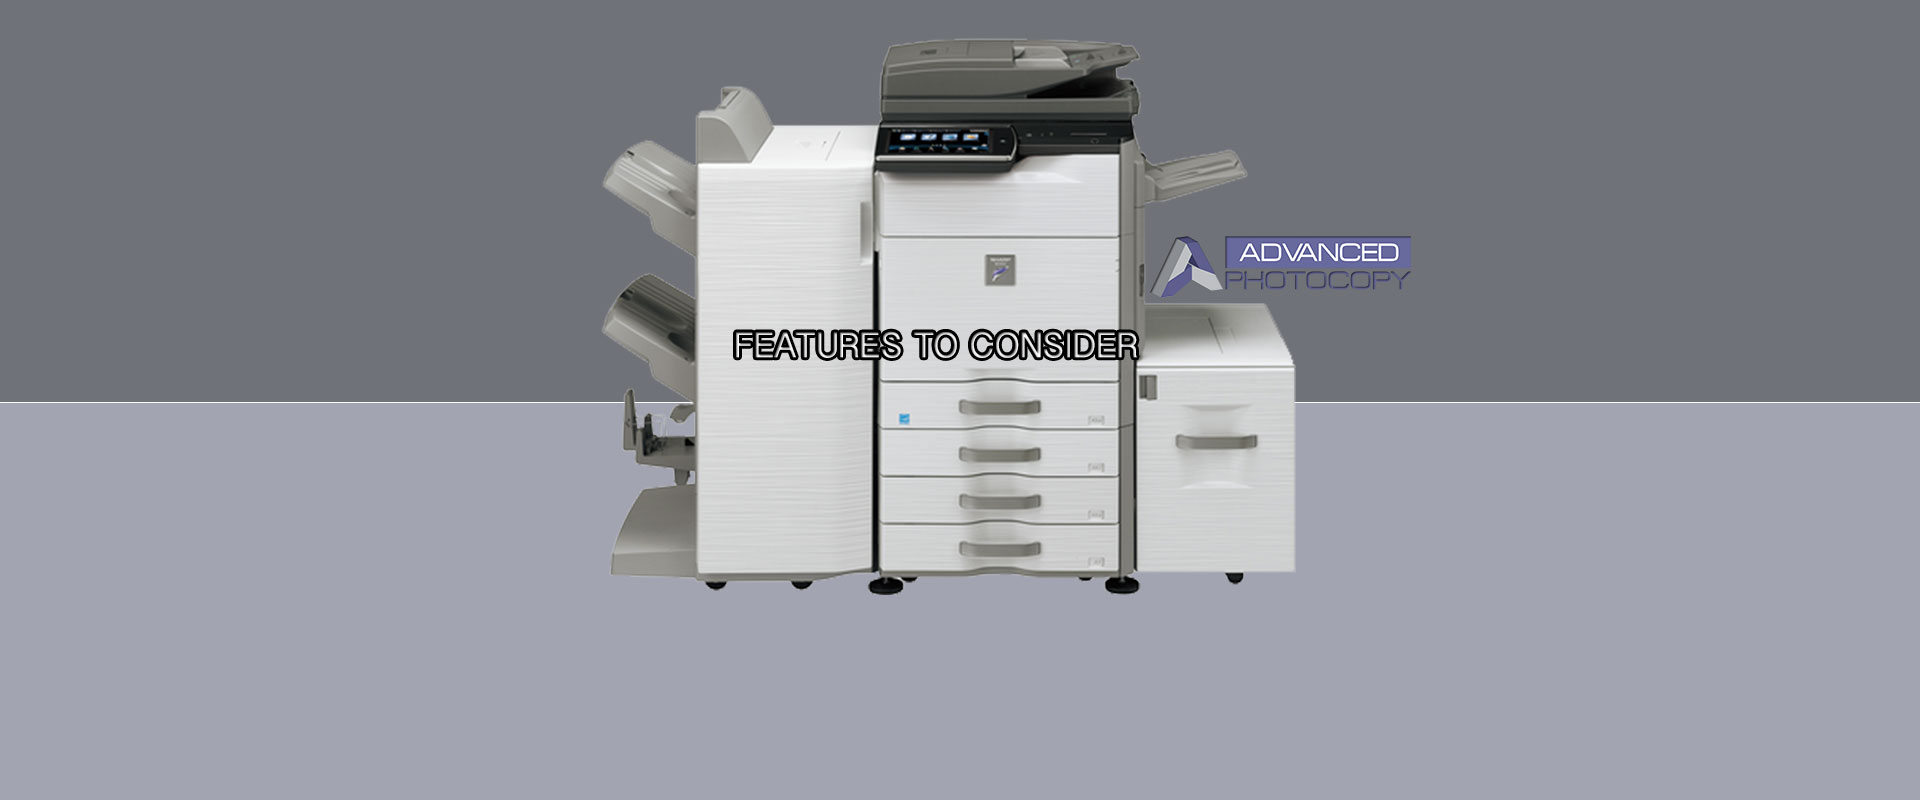 Printers in NJ - Advanced Photocopy